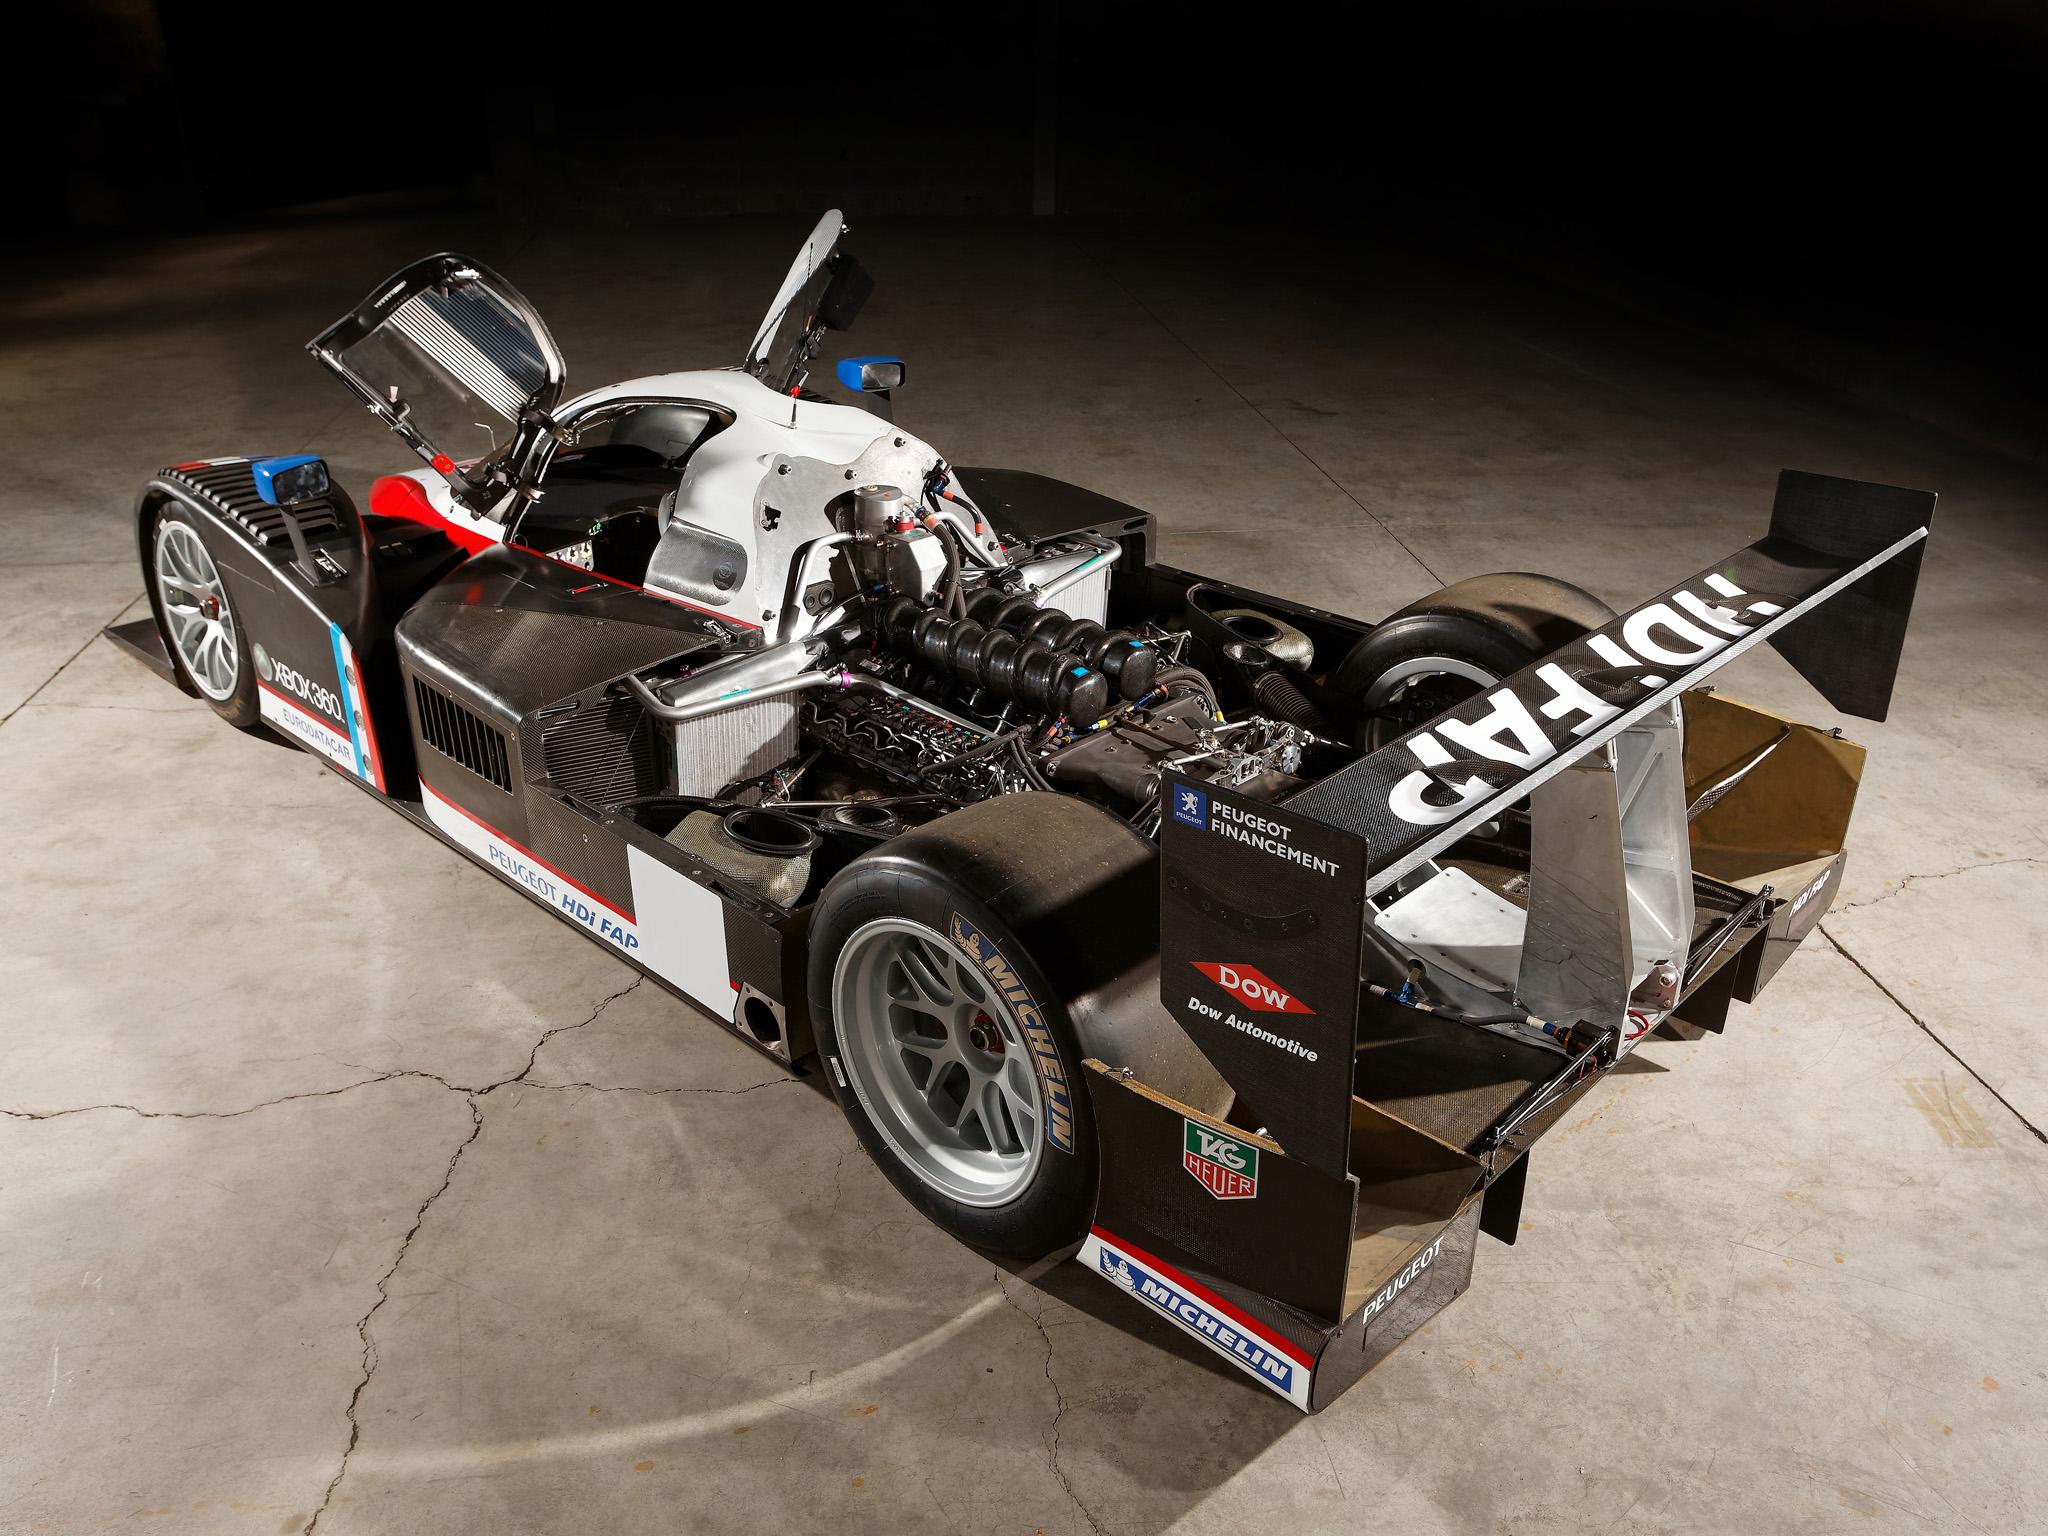 2007 peugeot 908 hdi fap race racing lemans engine